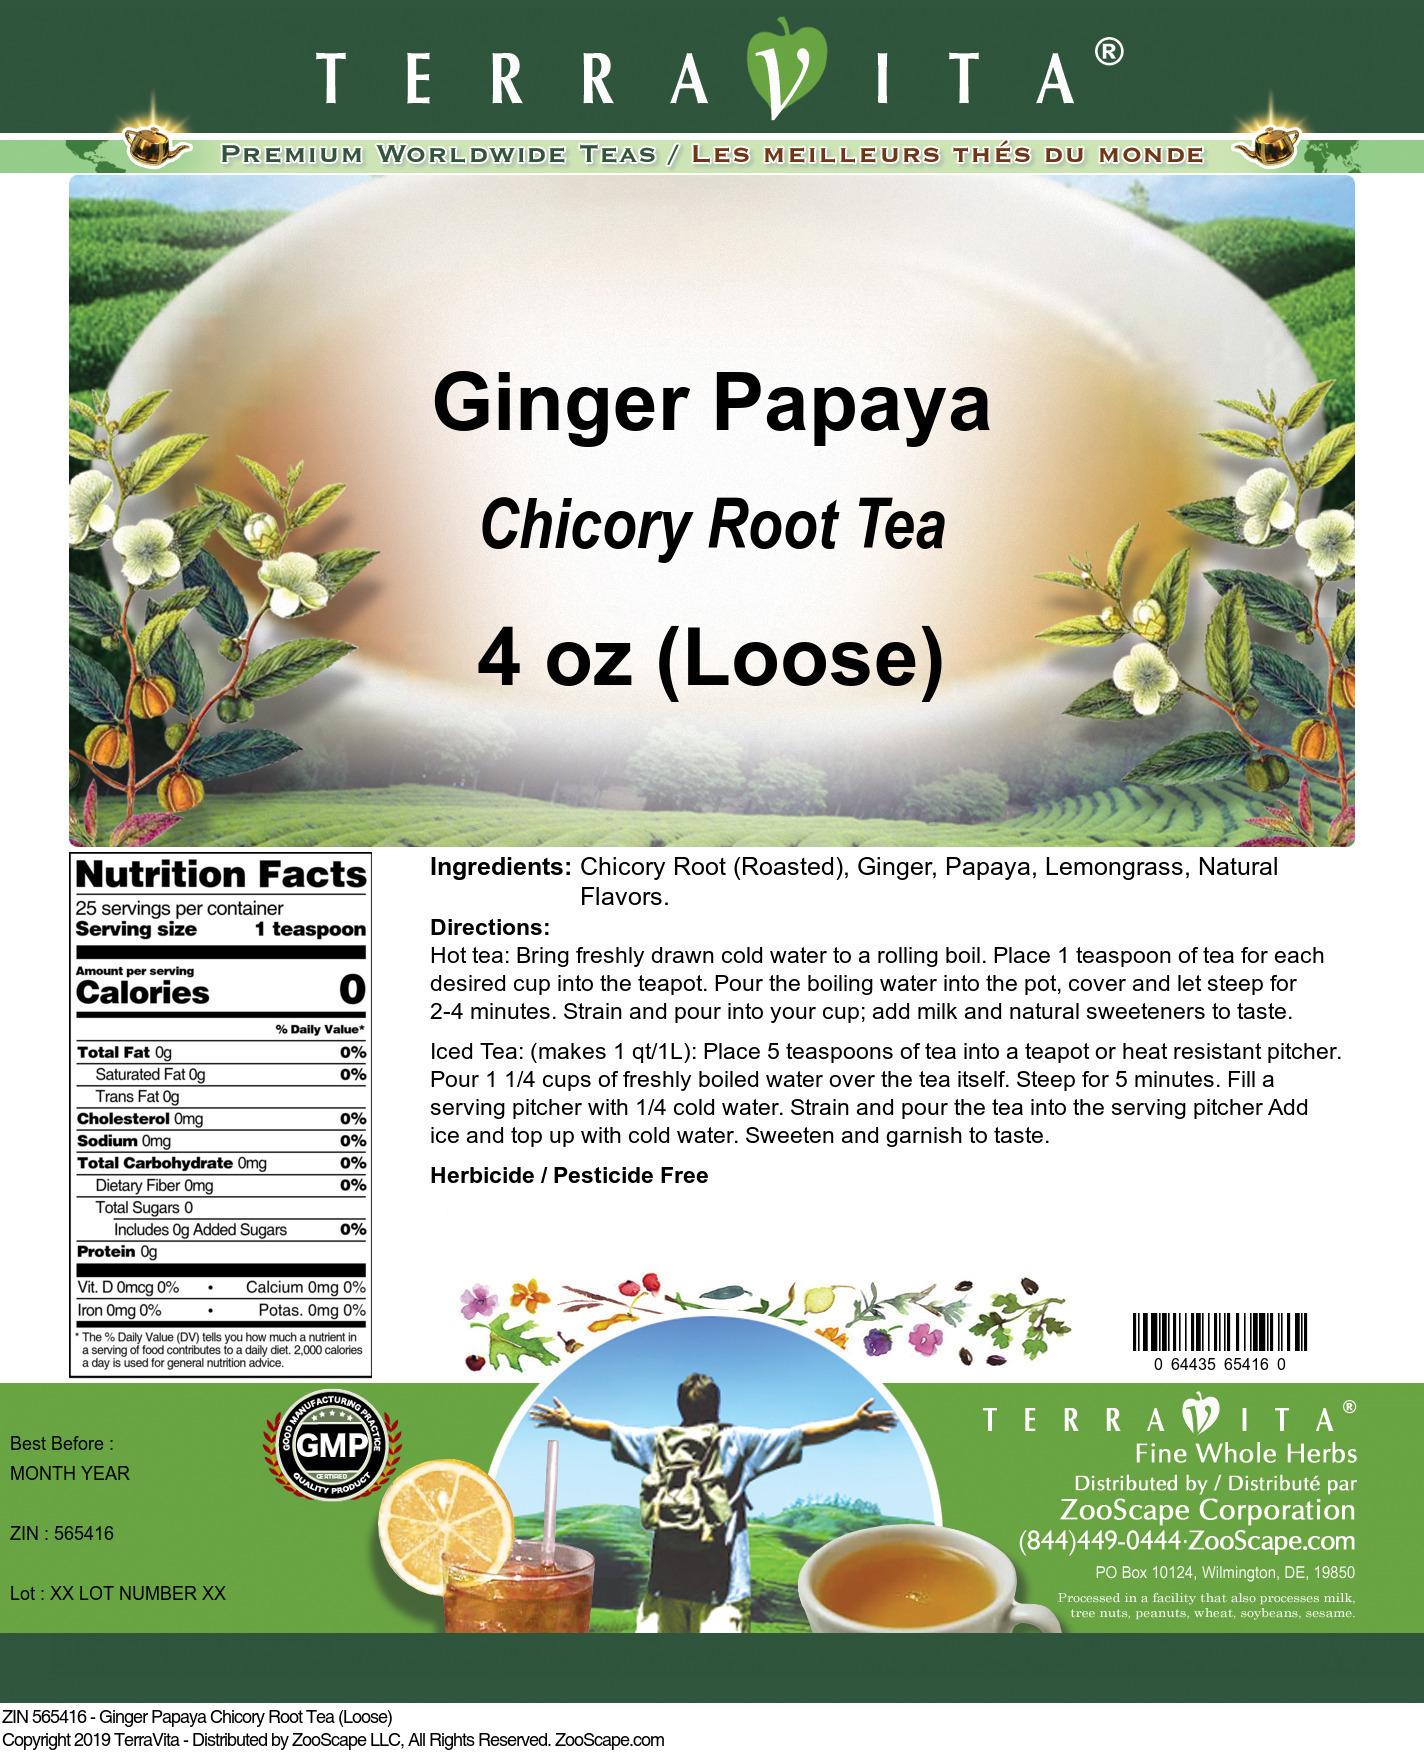 Ginger Papaya Chicory Root